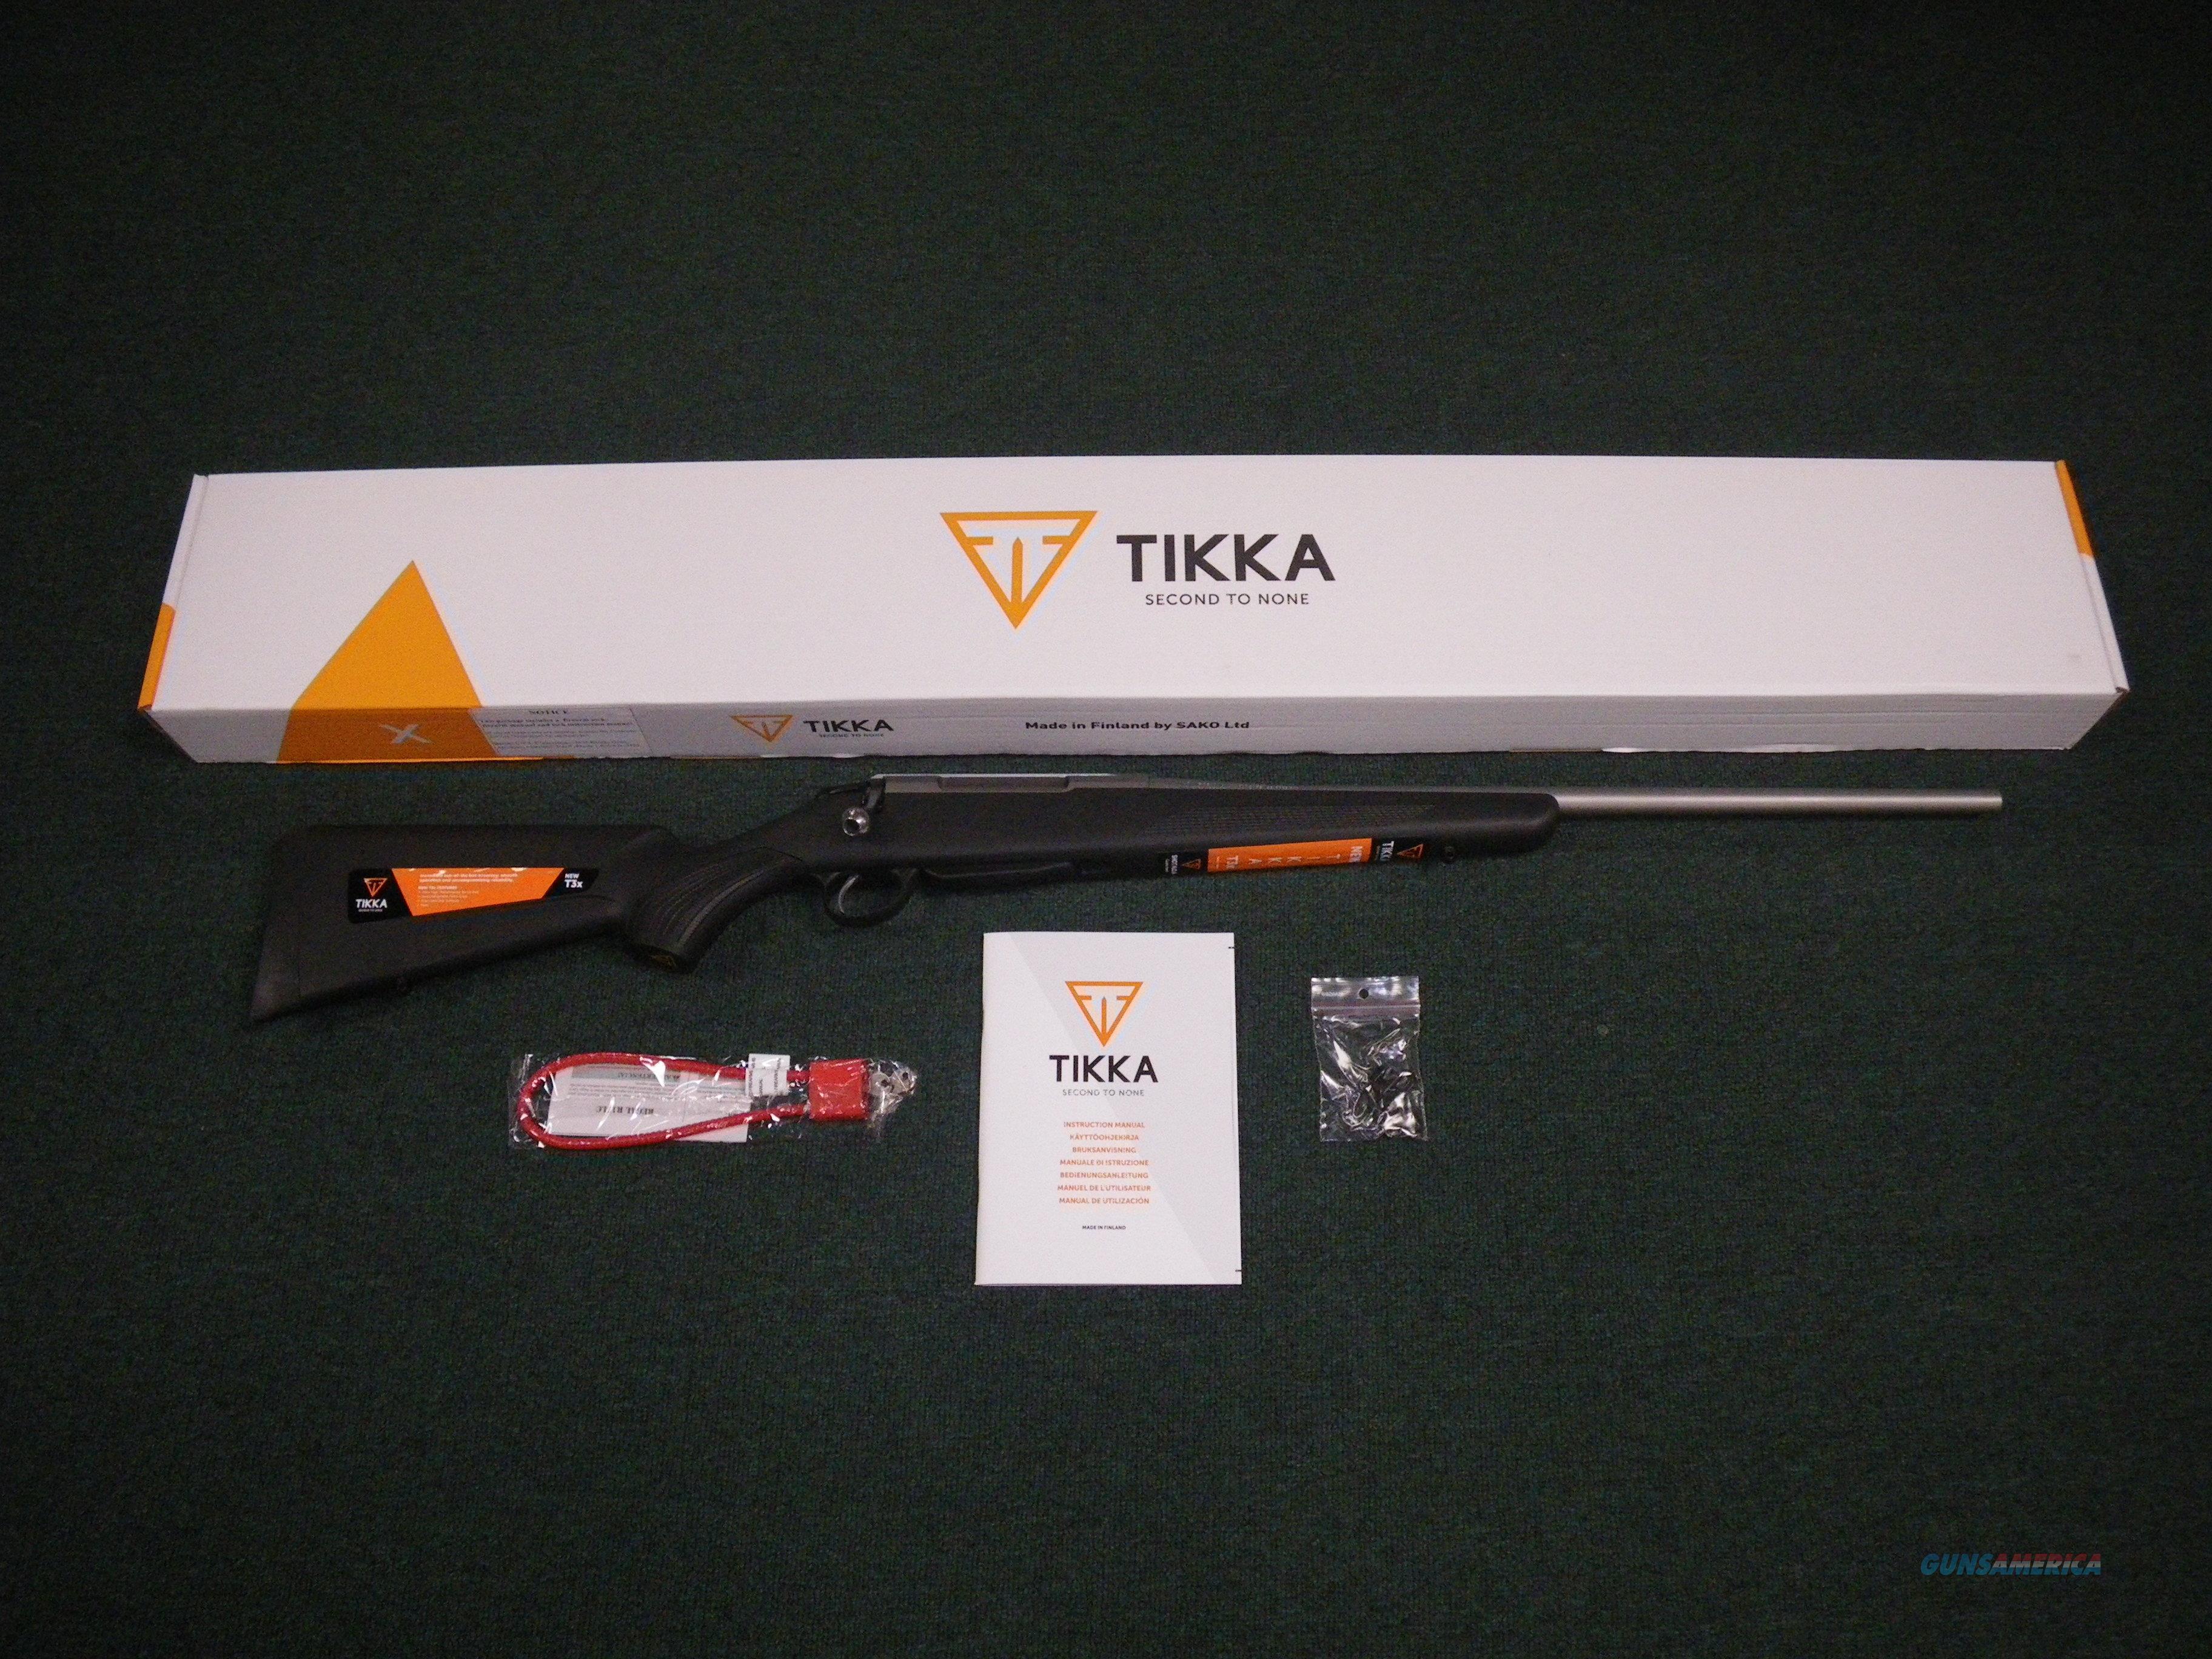 "Tikka T3x Lite Stainless/Synthetic 22-250 Rem 22.4"" NEW #JRTXB314  Guns > Rifles > Tikka Rifles > T3"